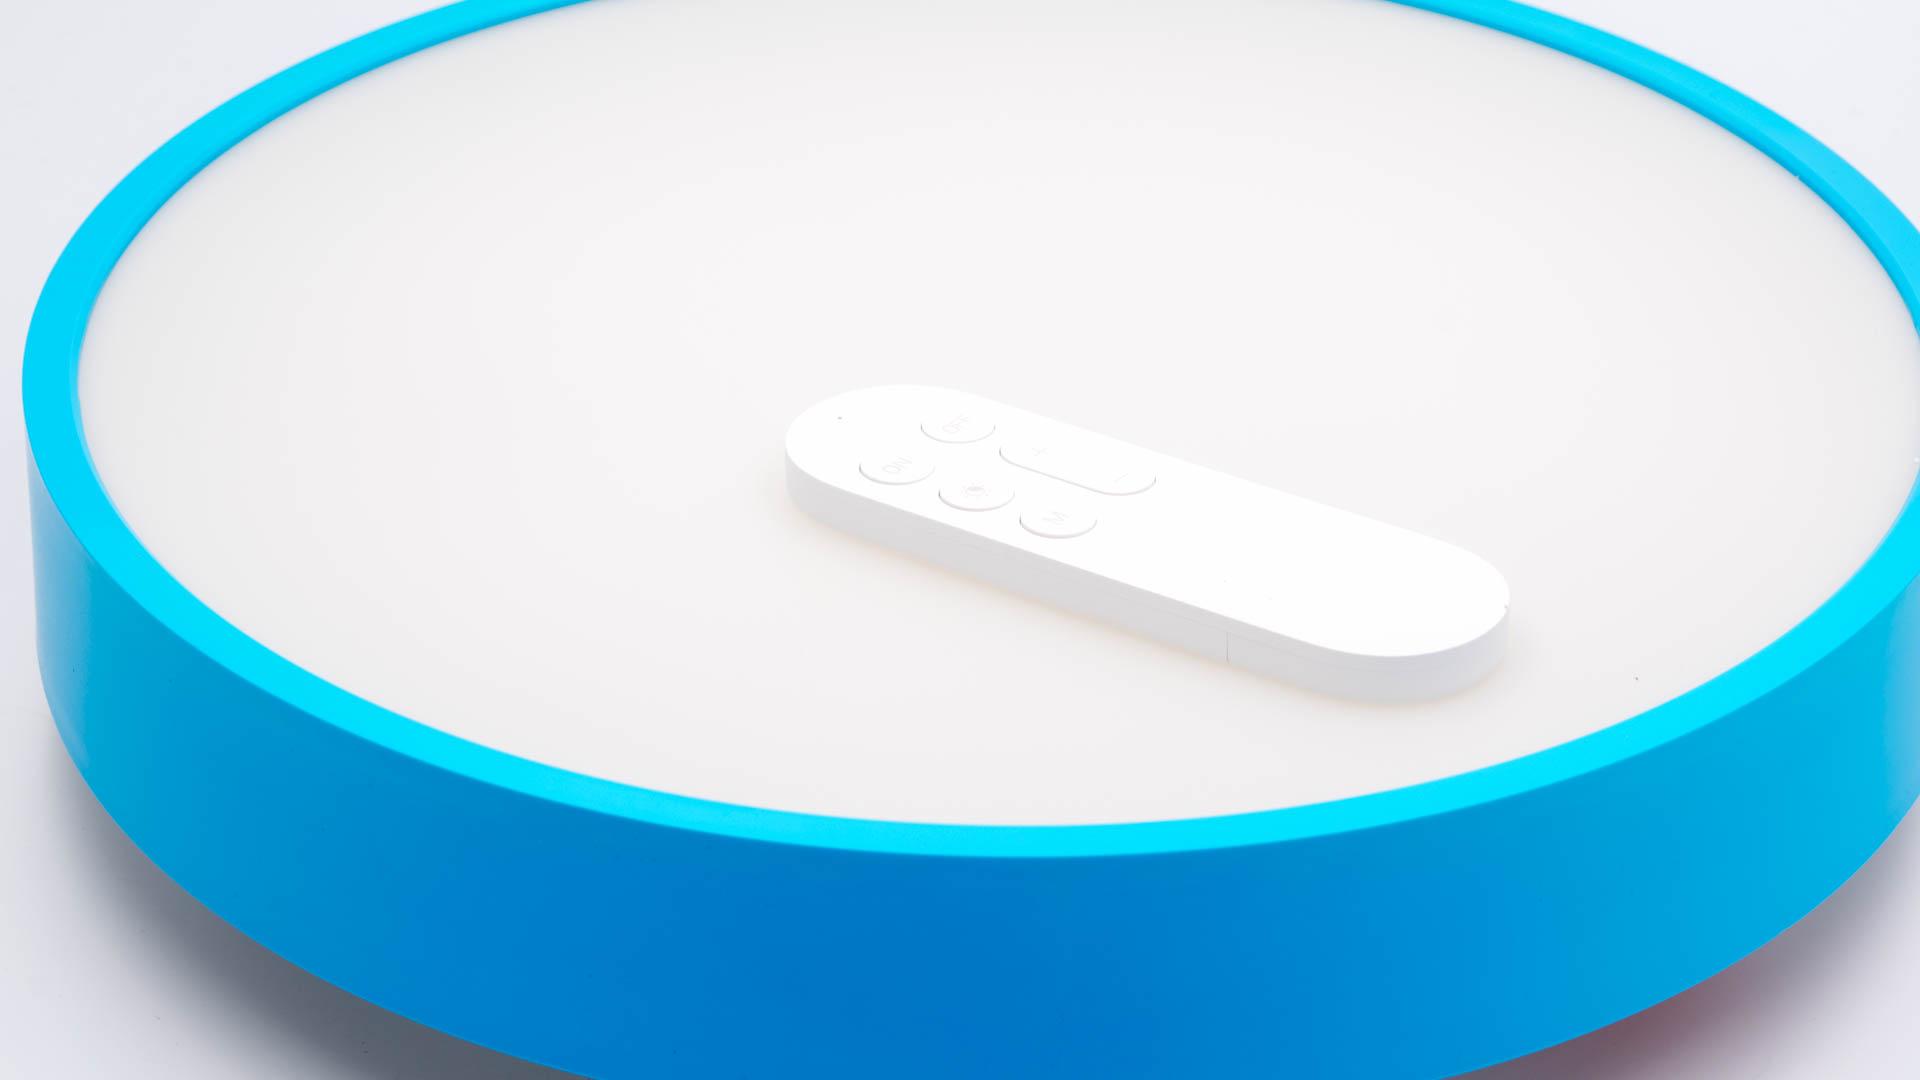 Die Xiaomi Yeelight Smart Led Ceiling Light Im Test Inklusive